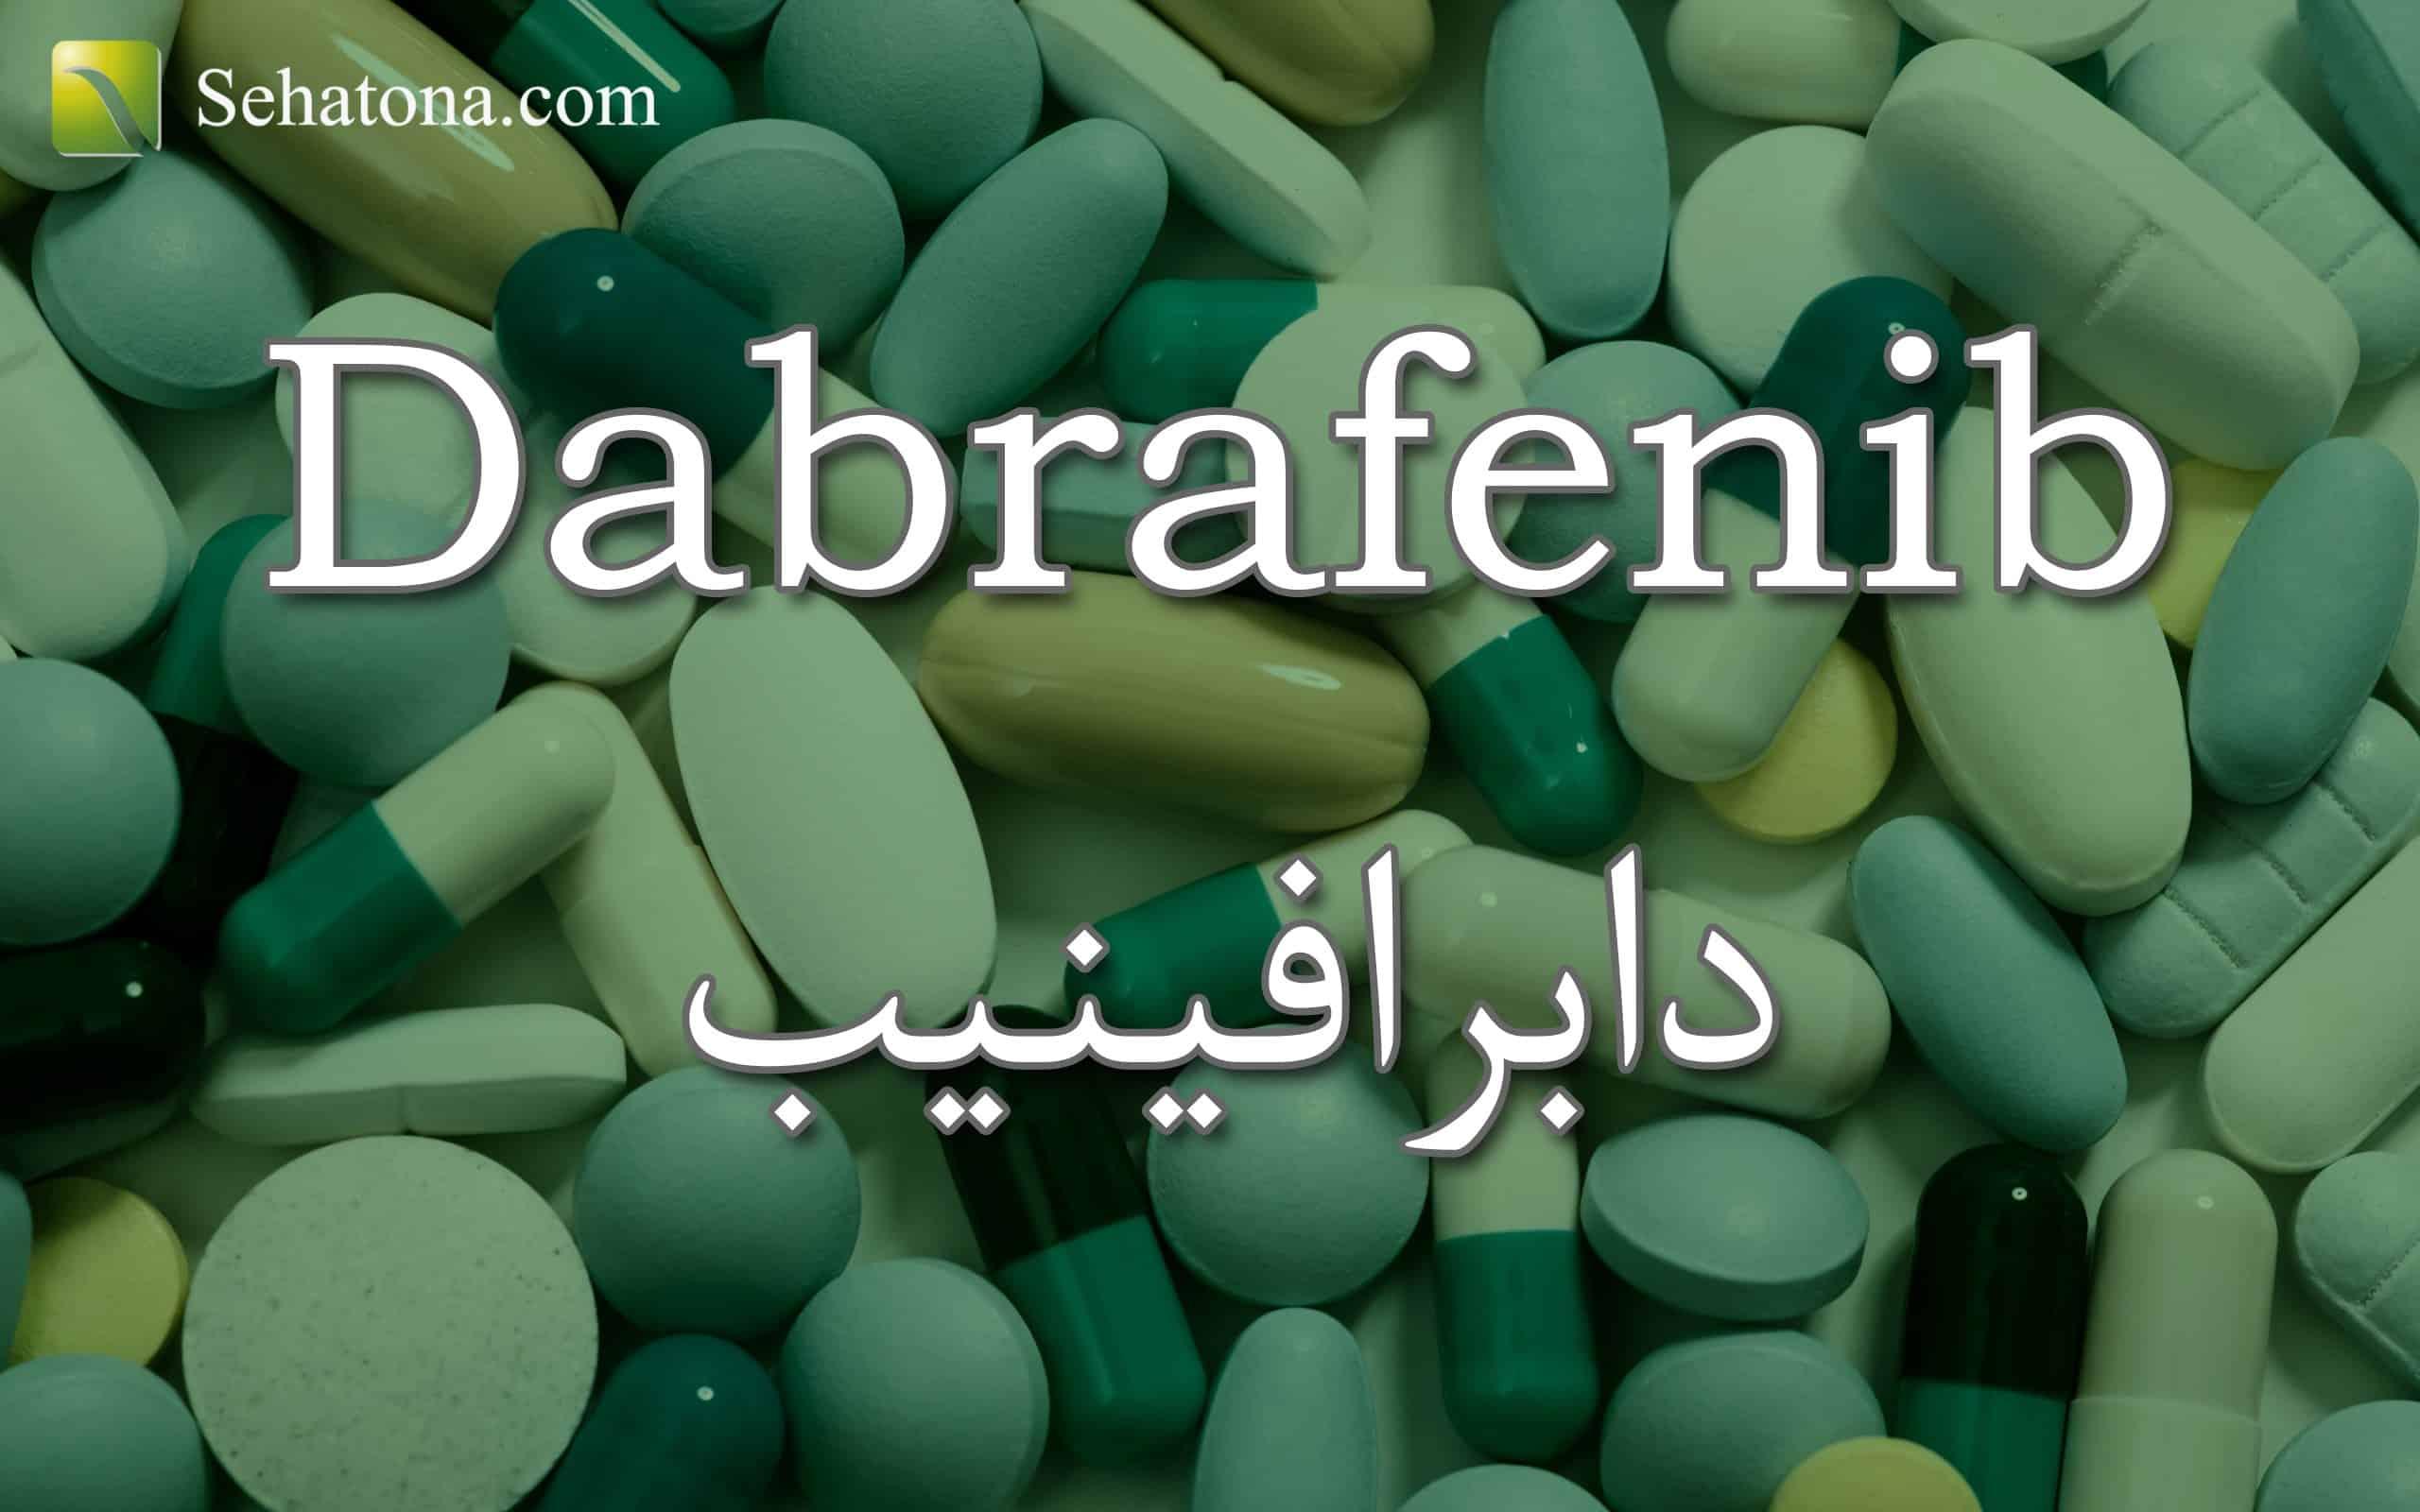 Dabrafenib